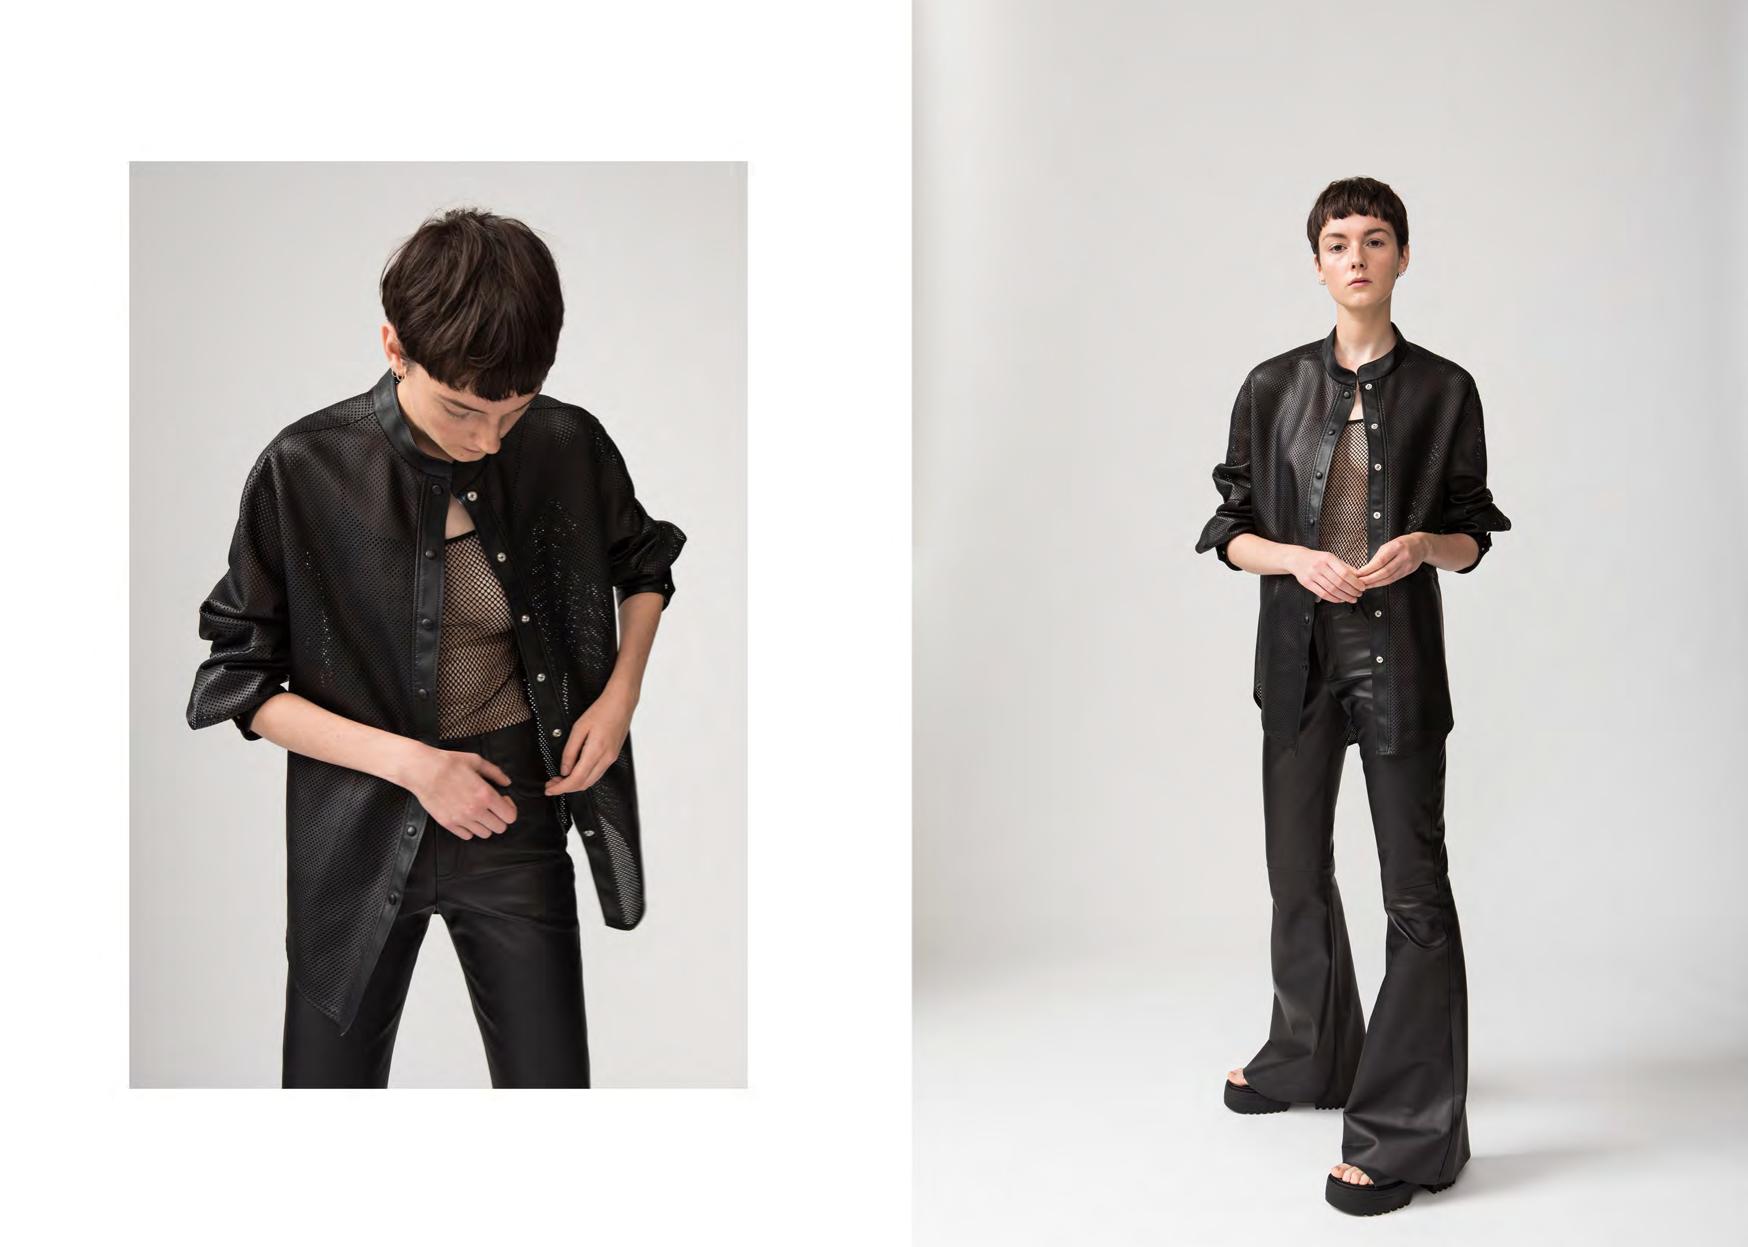 Fashion designer di moda linda calugi per twins florence